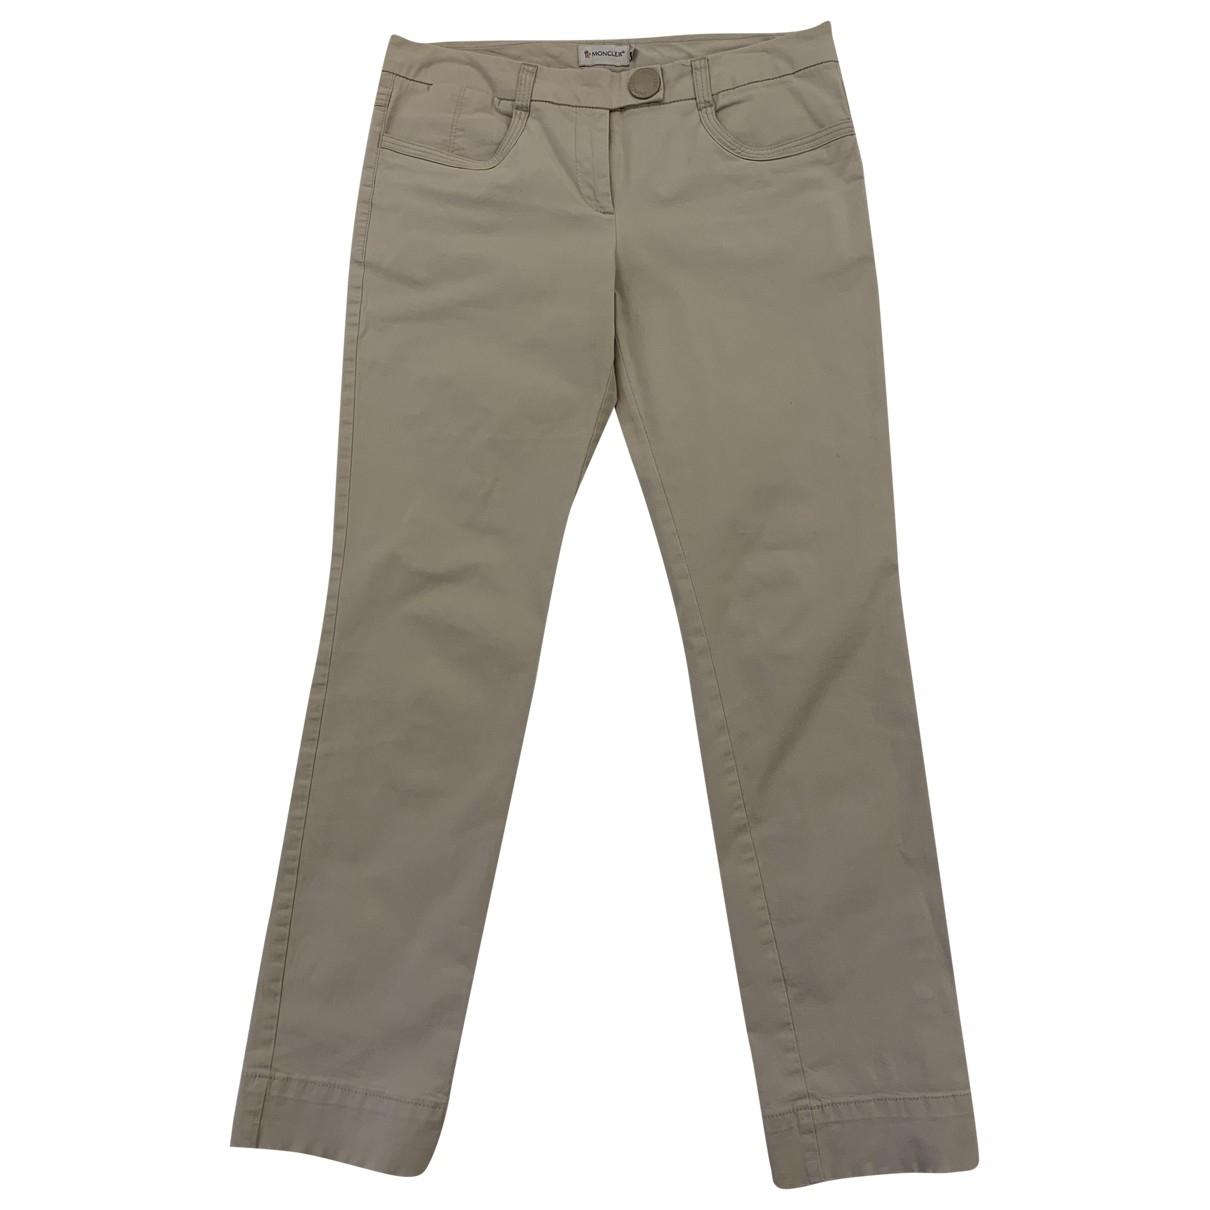 Moncler \N Beige Cotton Trousers for Women 40 IT